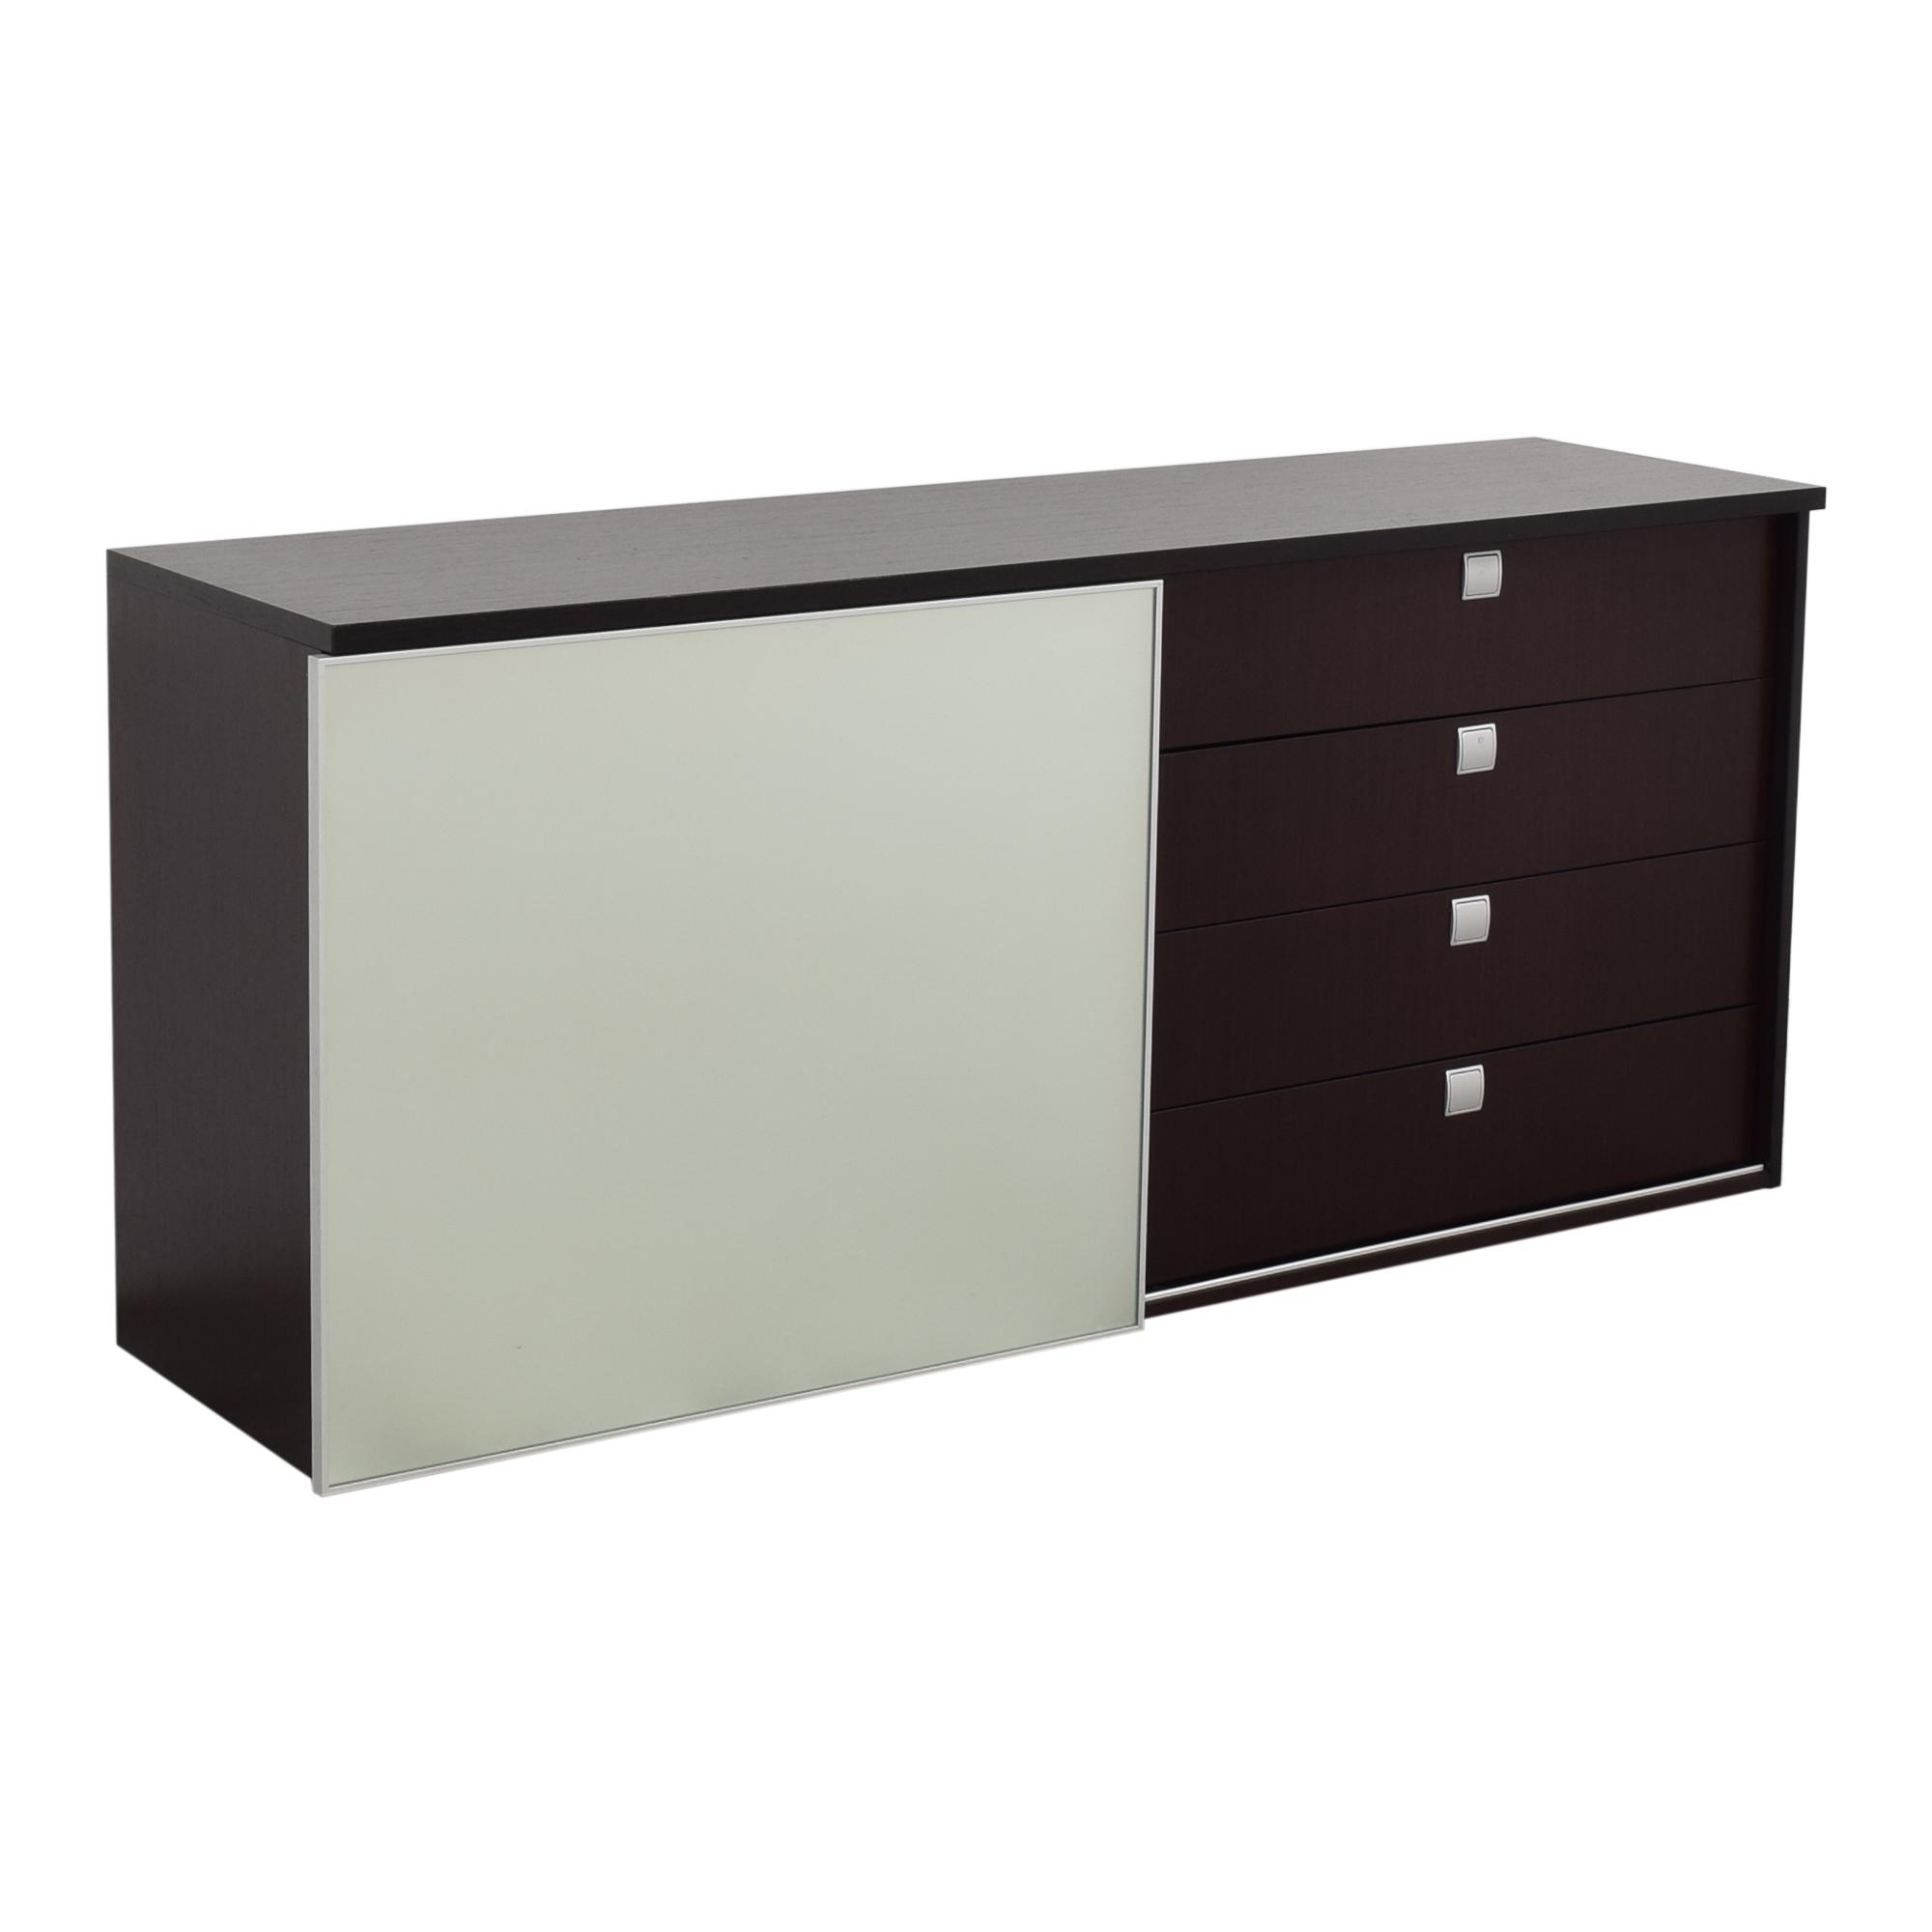 shop Jensen-Lewis Jensen-Lewis Modern Style Sideboard online